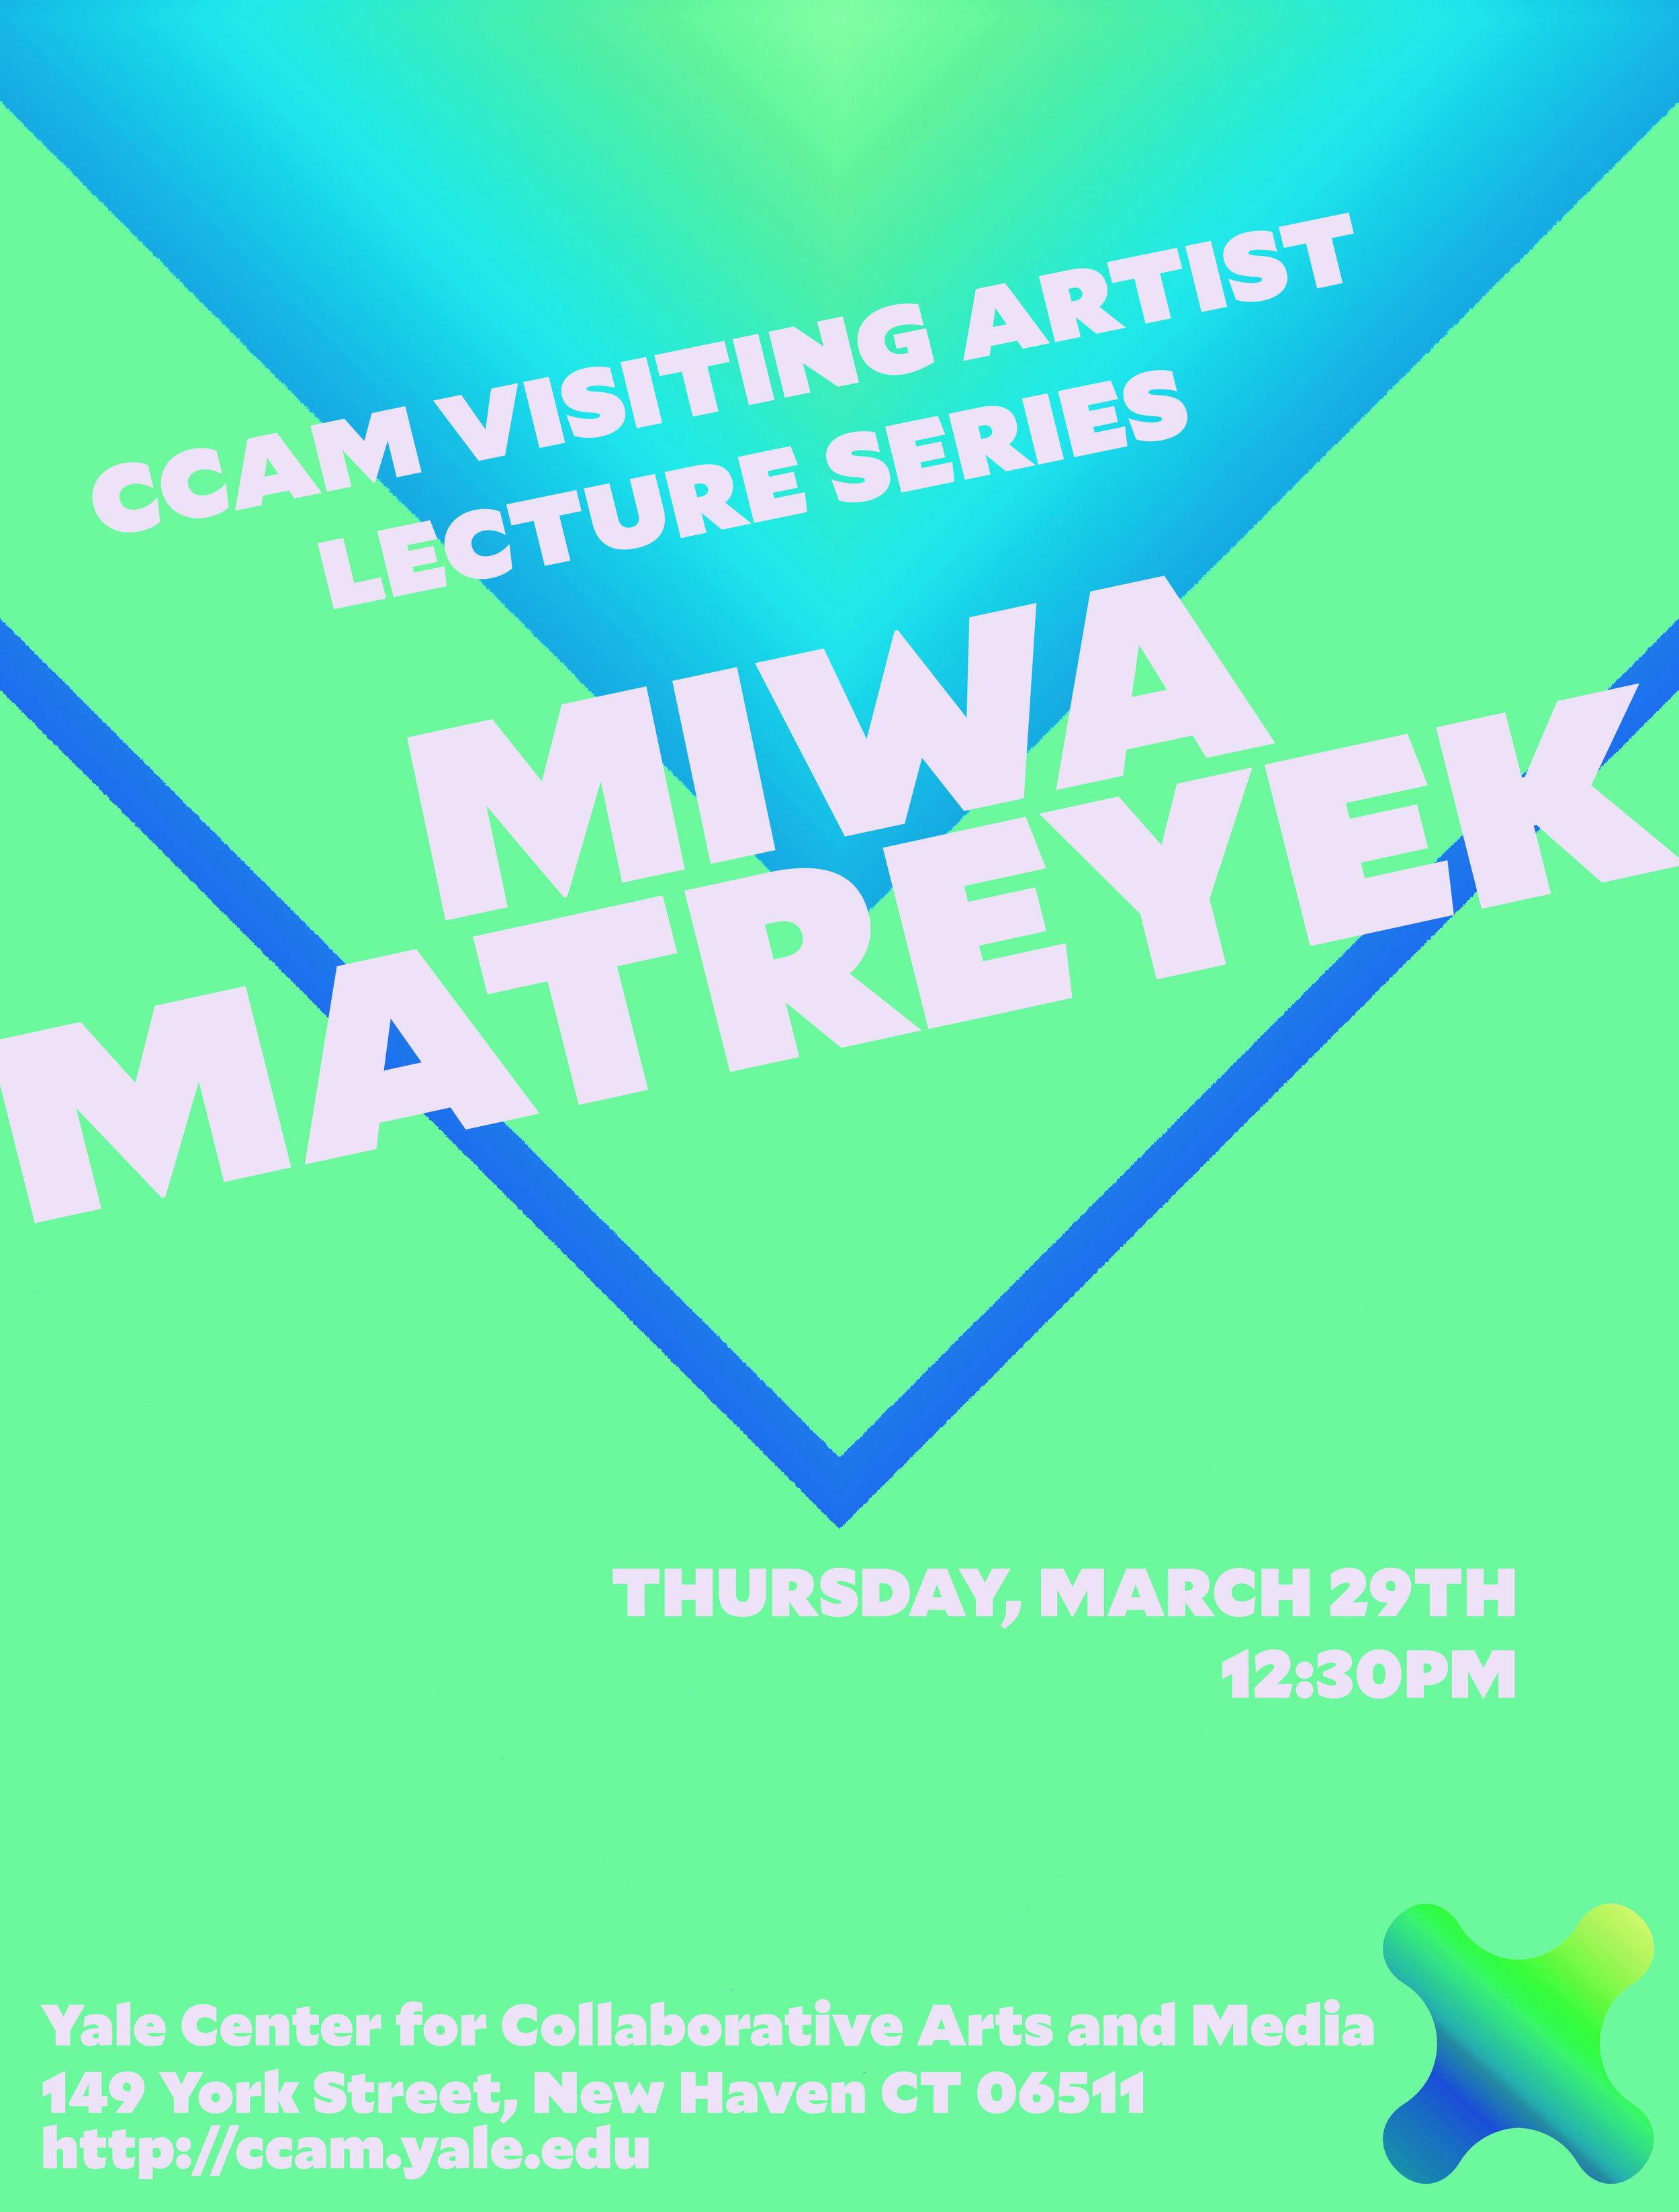 Miwa Matreyek Wilson Visiting Artist Poster.jpg